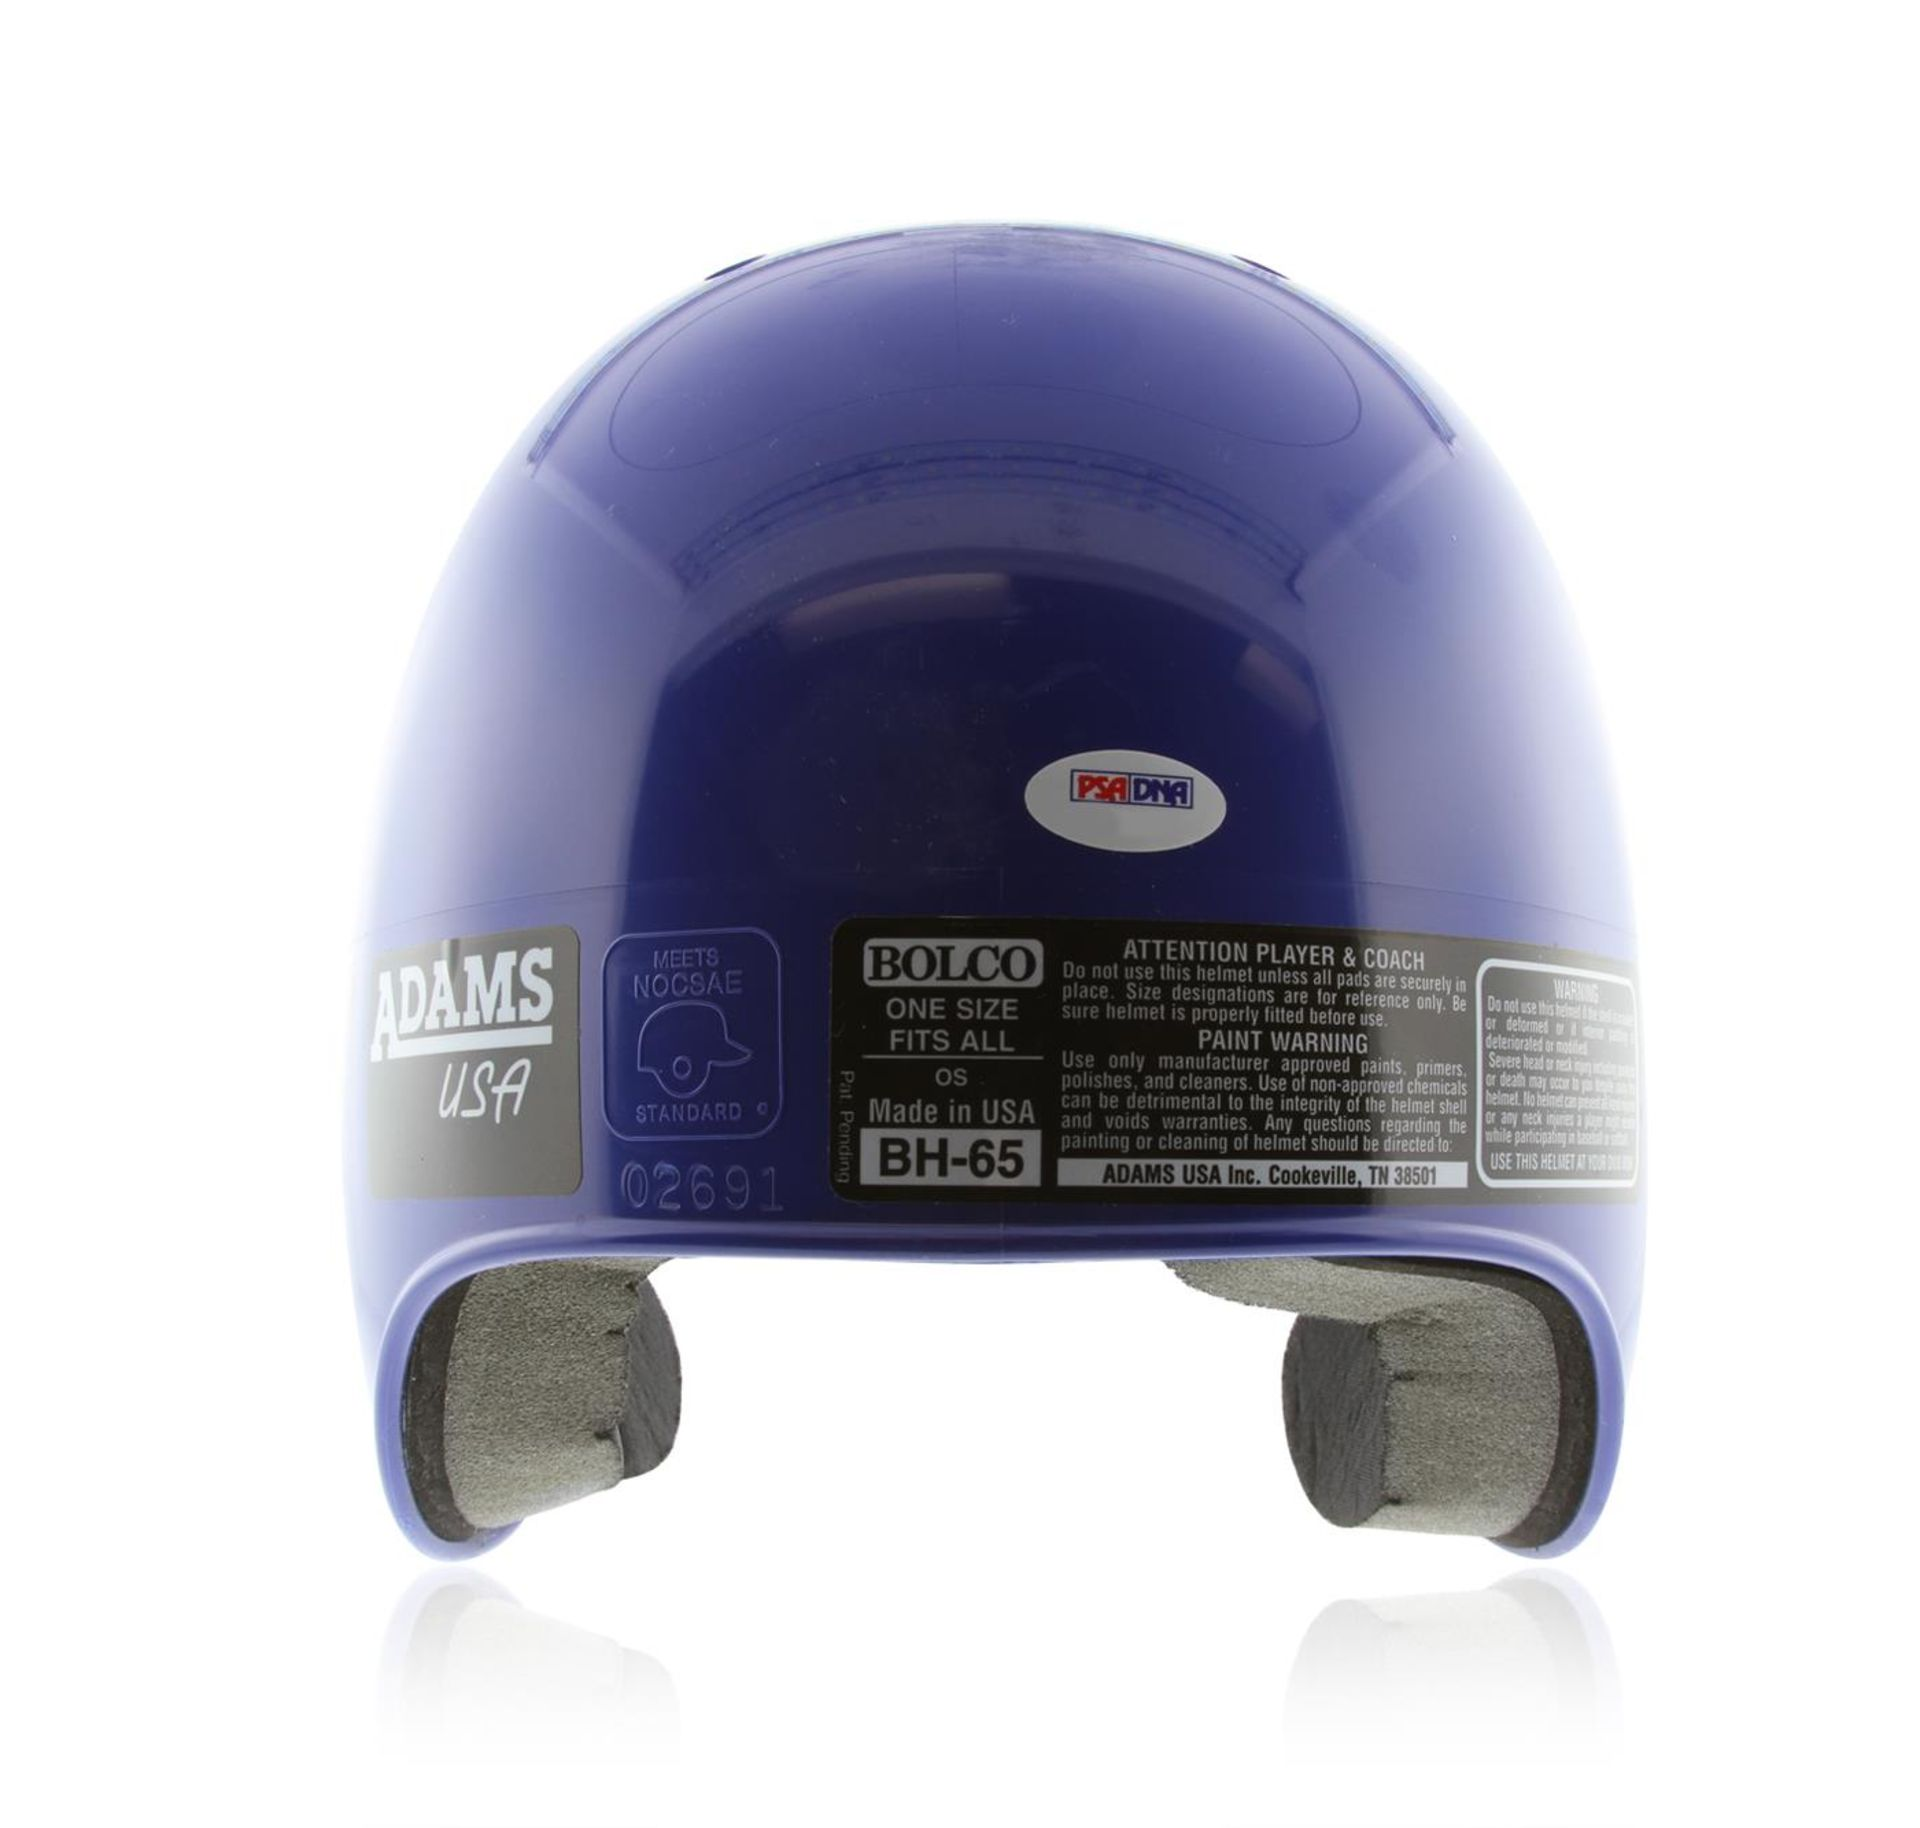 Autographed Duke Snider Brooklyn Helmet PSA Certified - Image 3 of 4